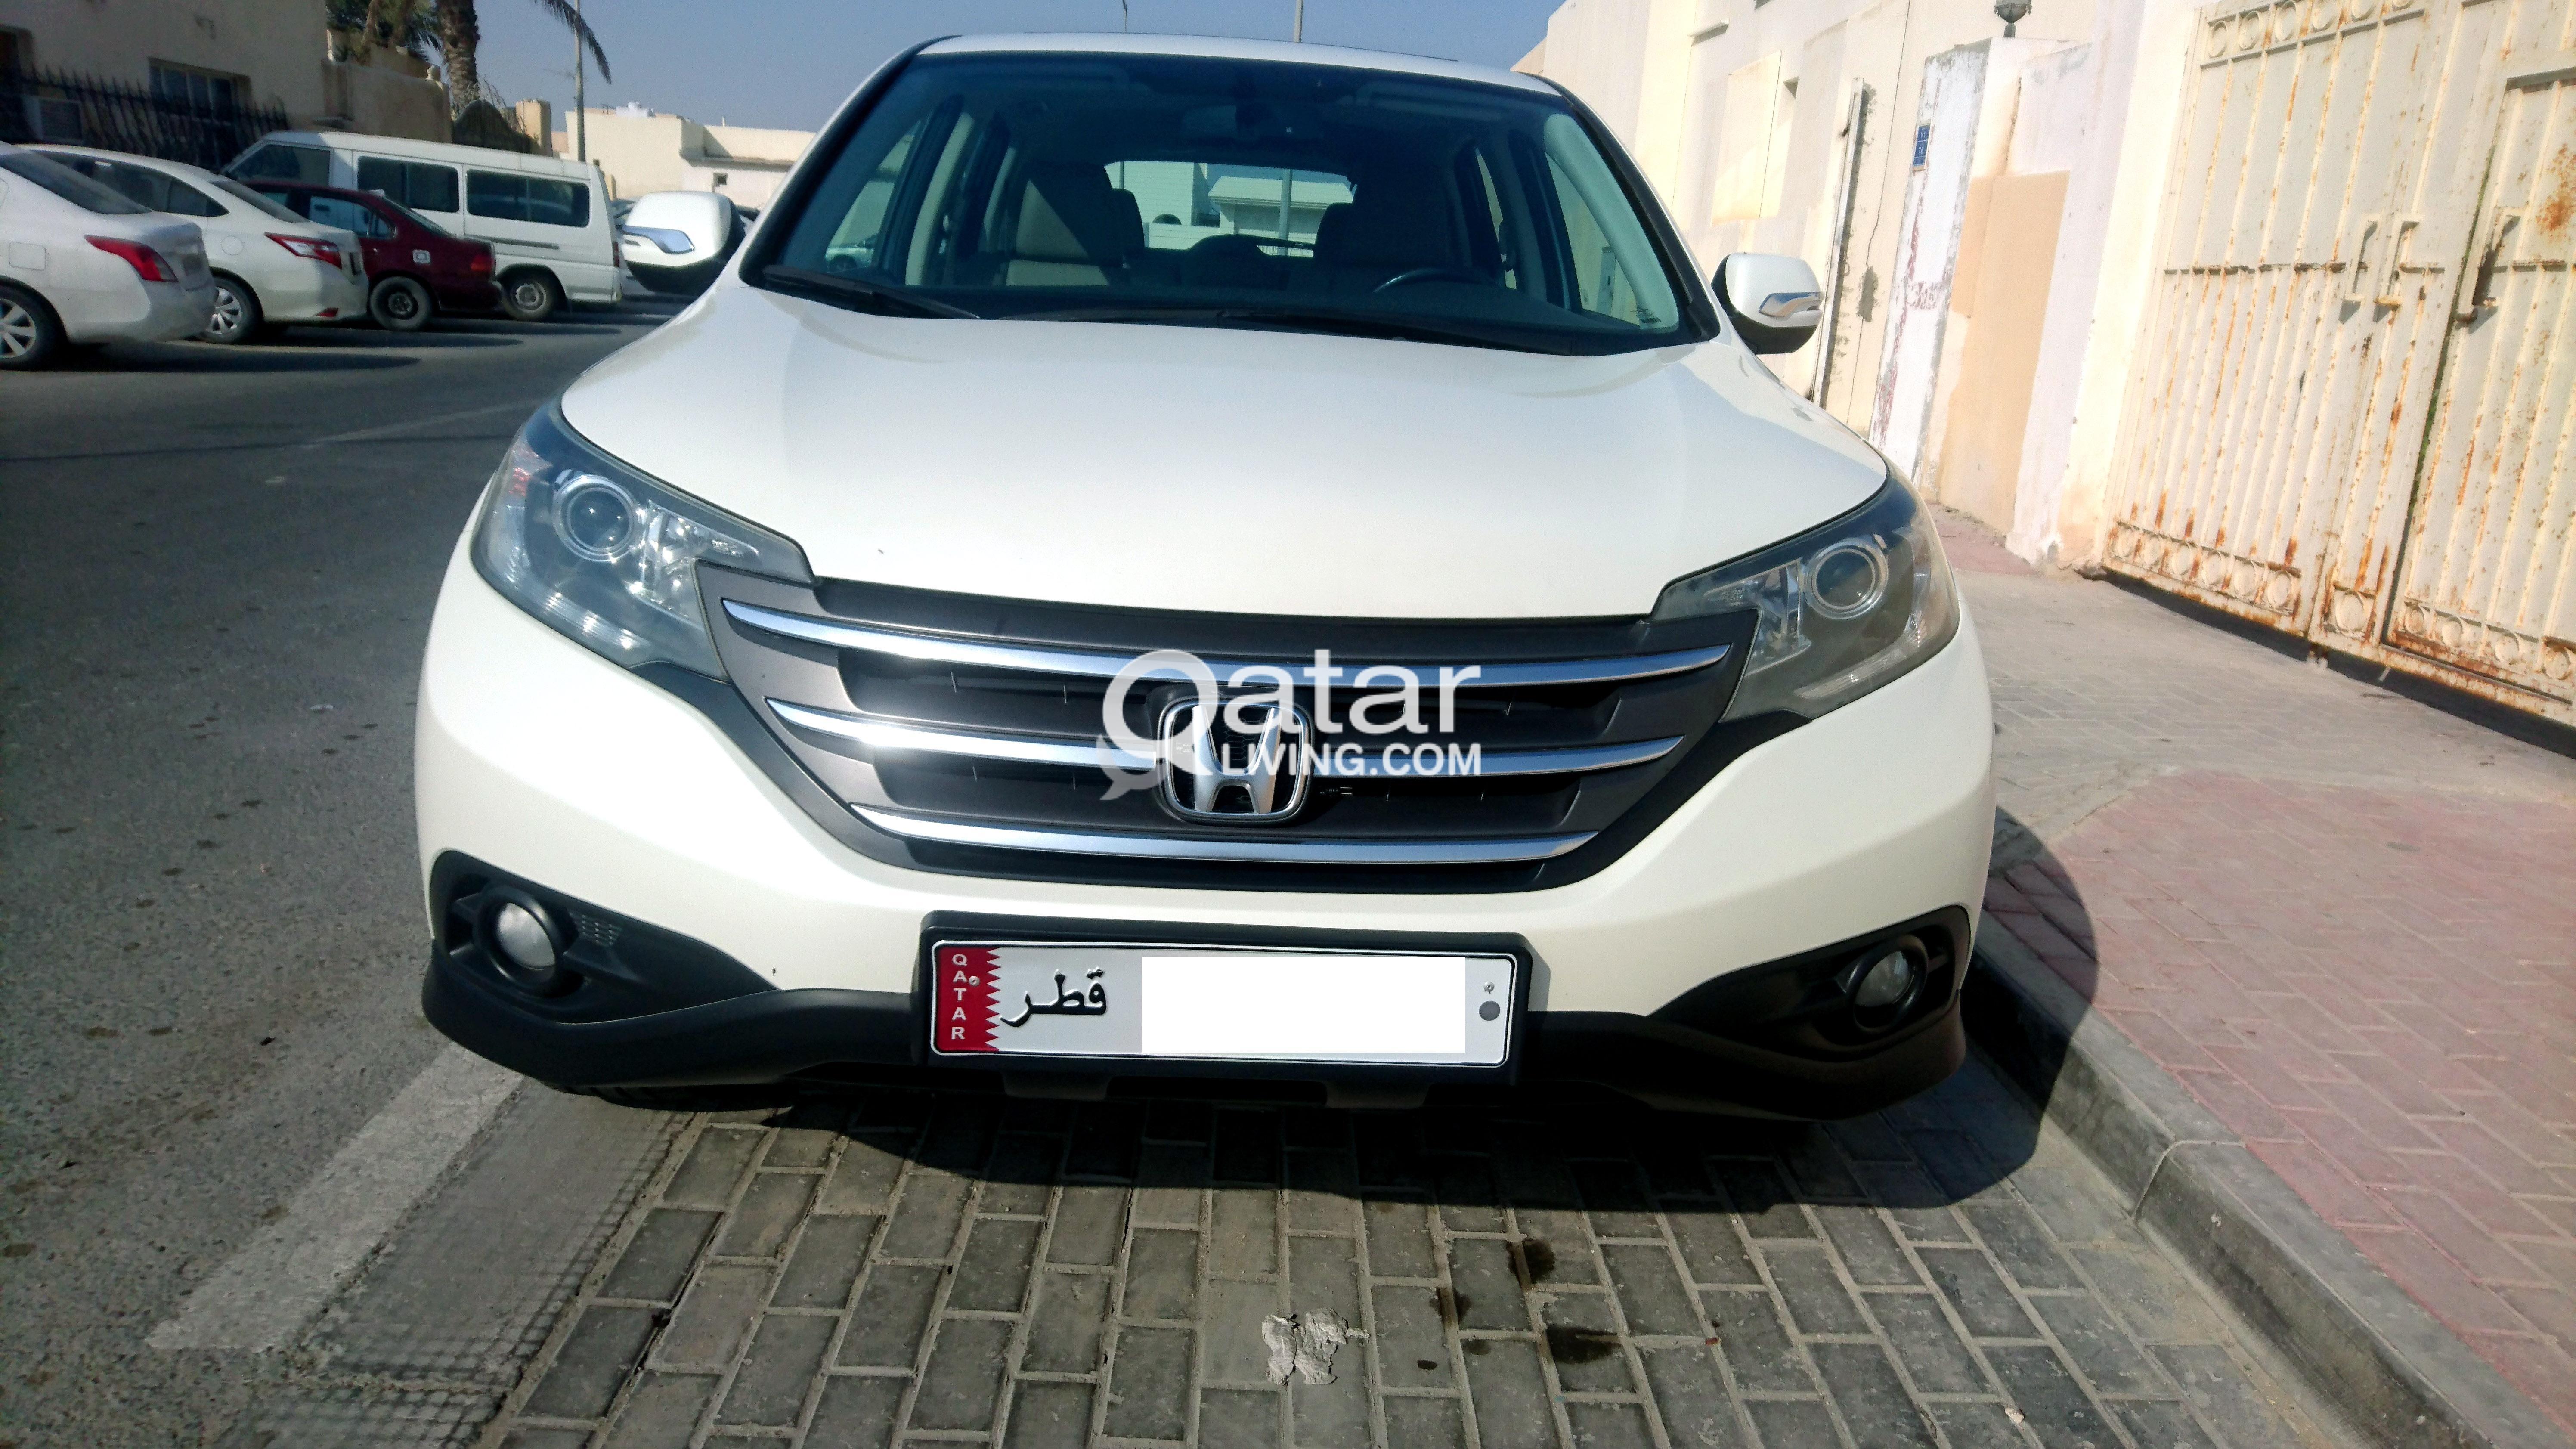 for white uk trim co motors cars ex cr used colour honda v crv sale